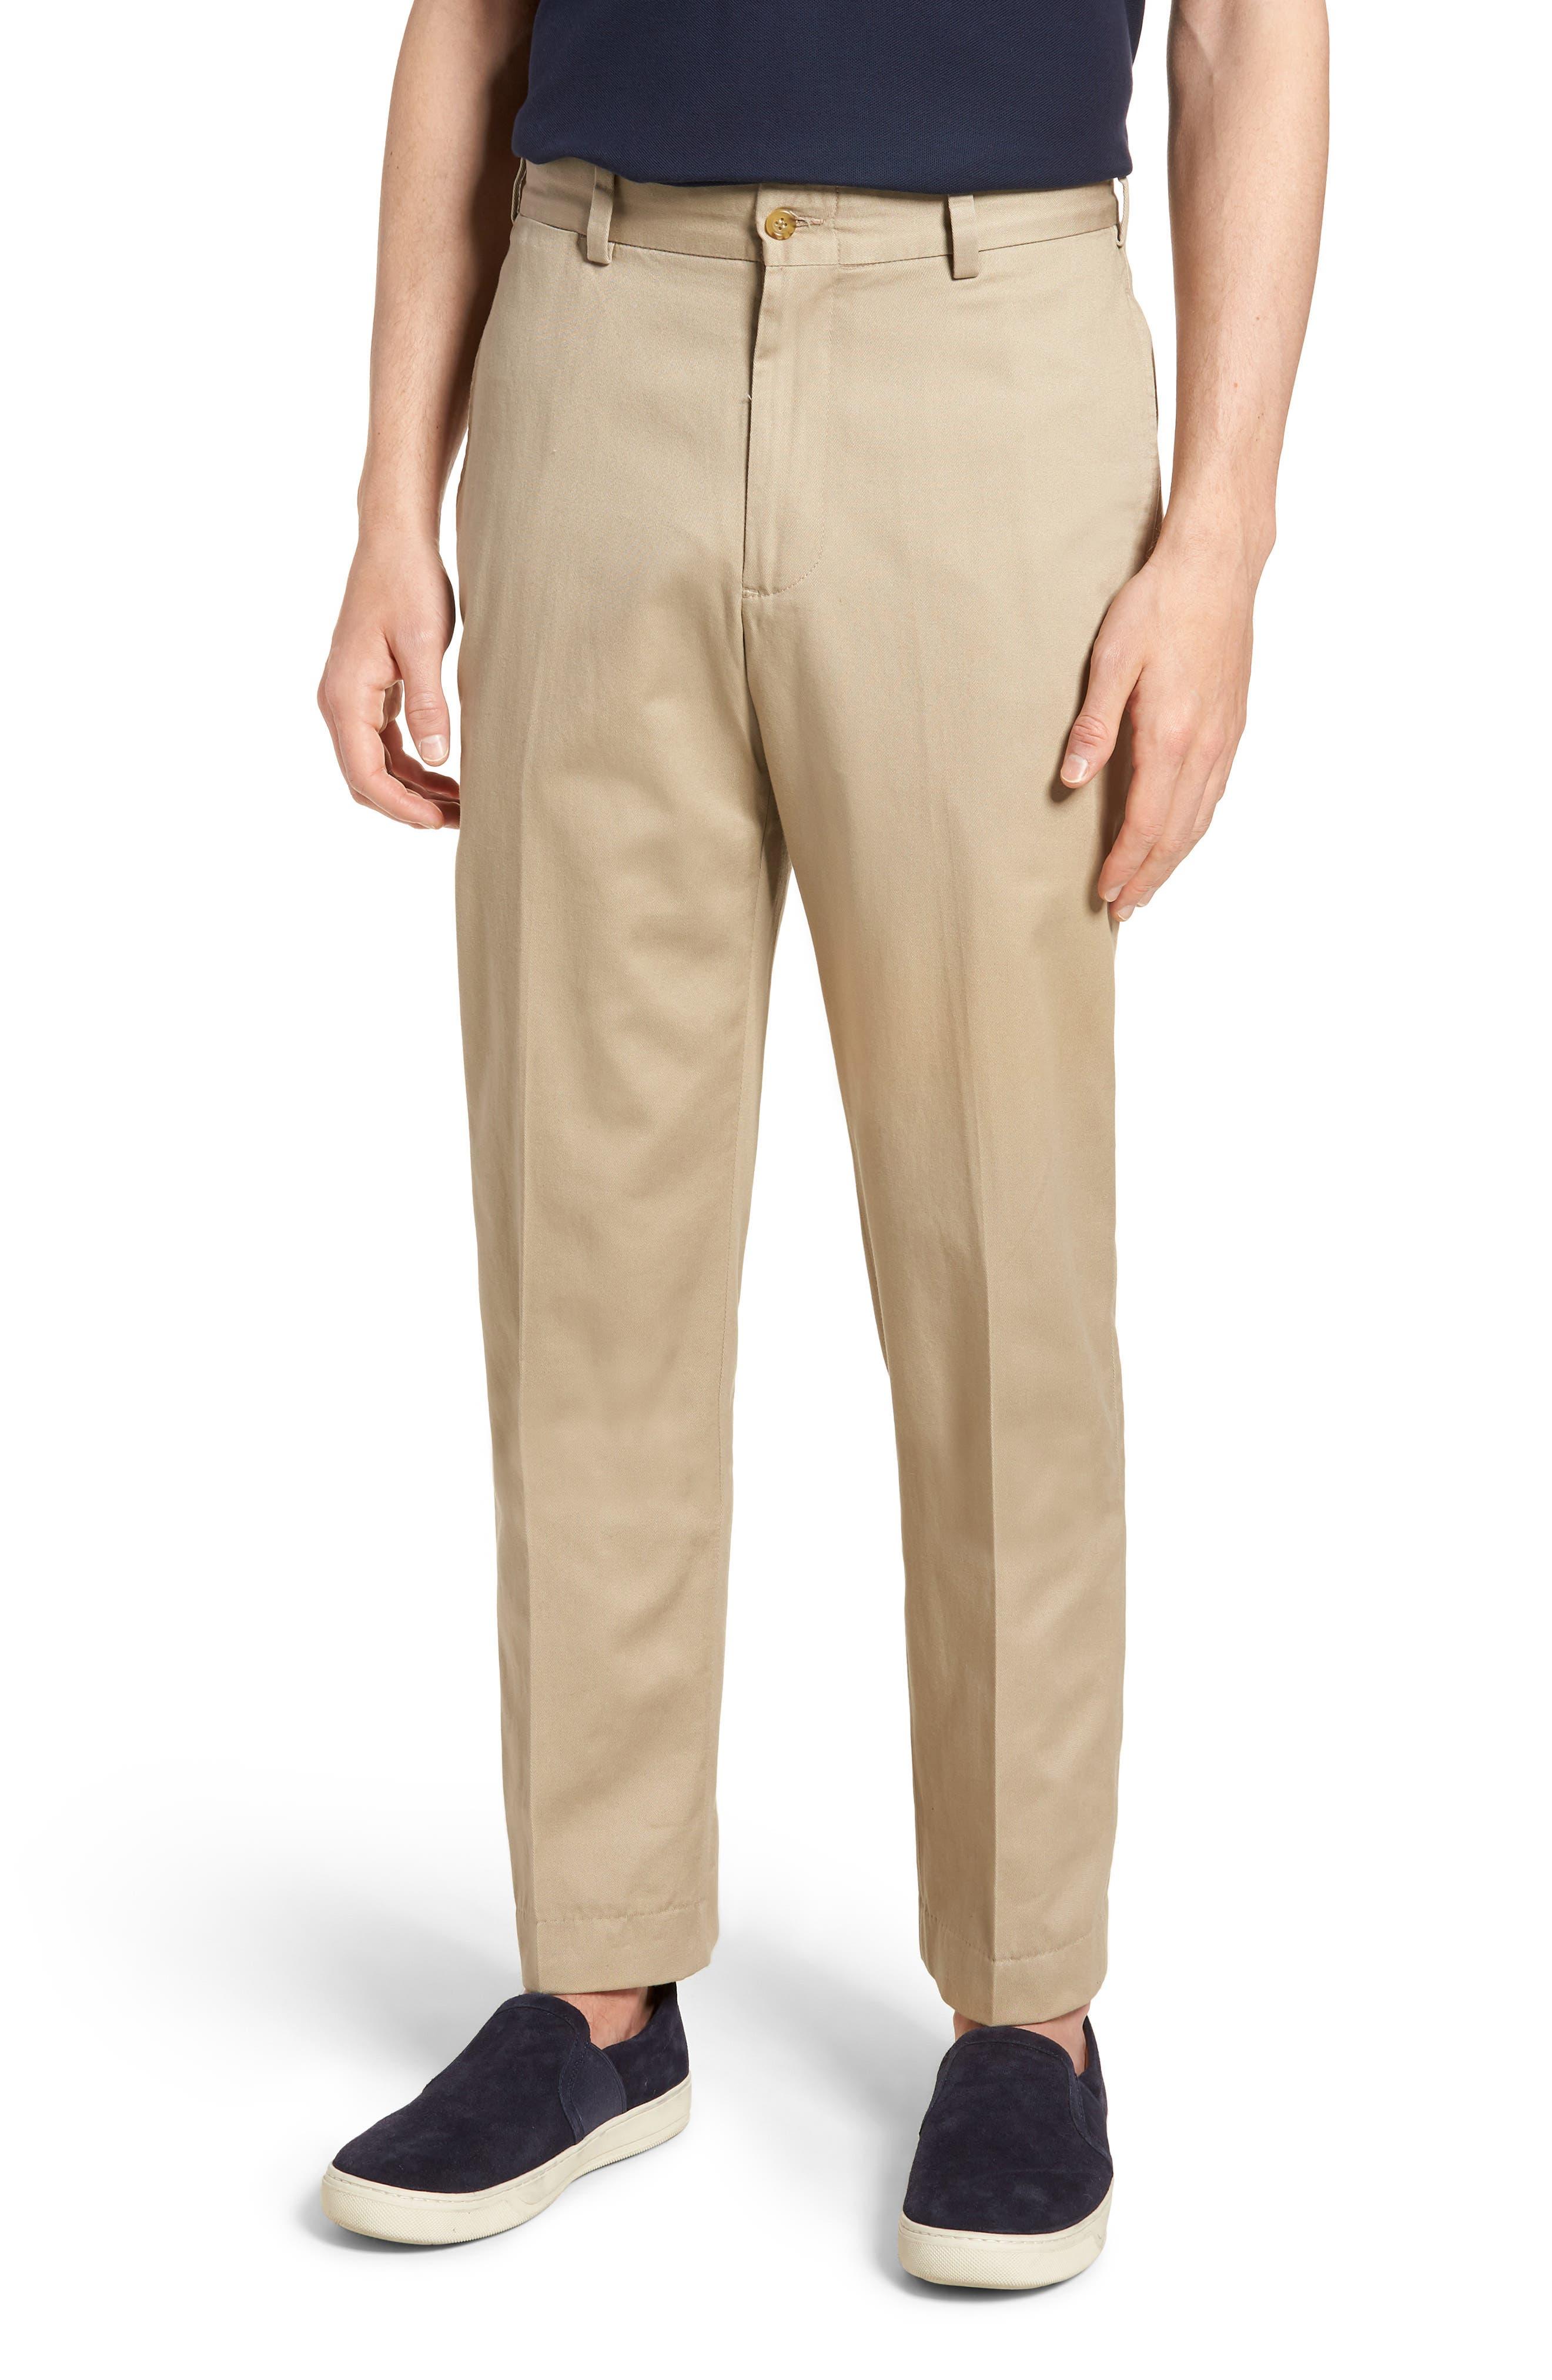 Bills Khakis M2 Classic Fit Vintage Twill Flat Front Pants